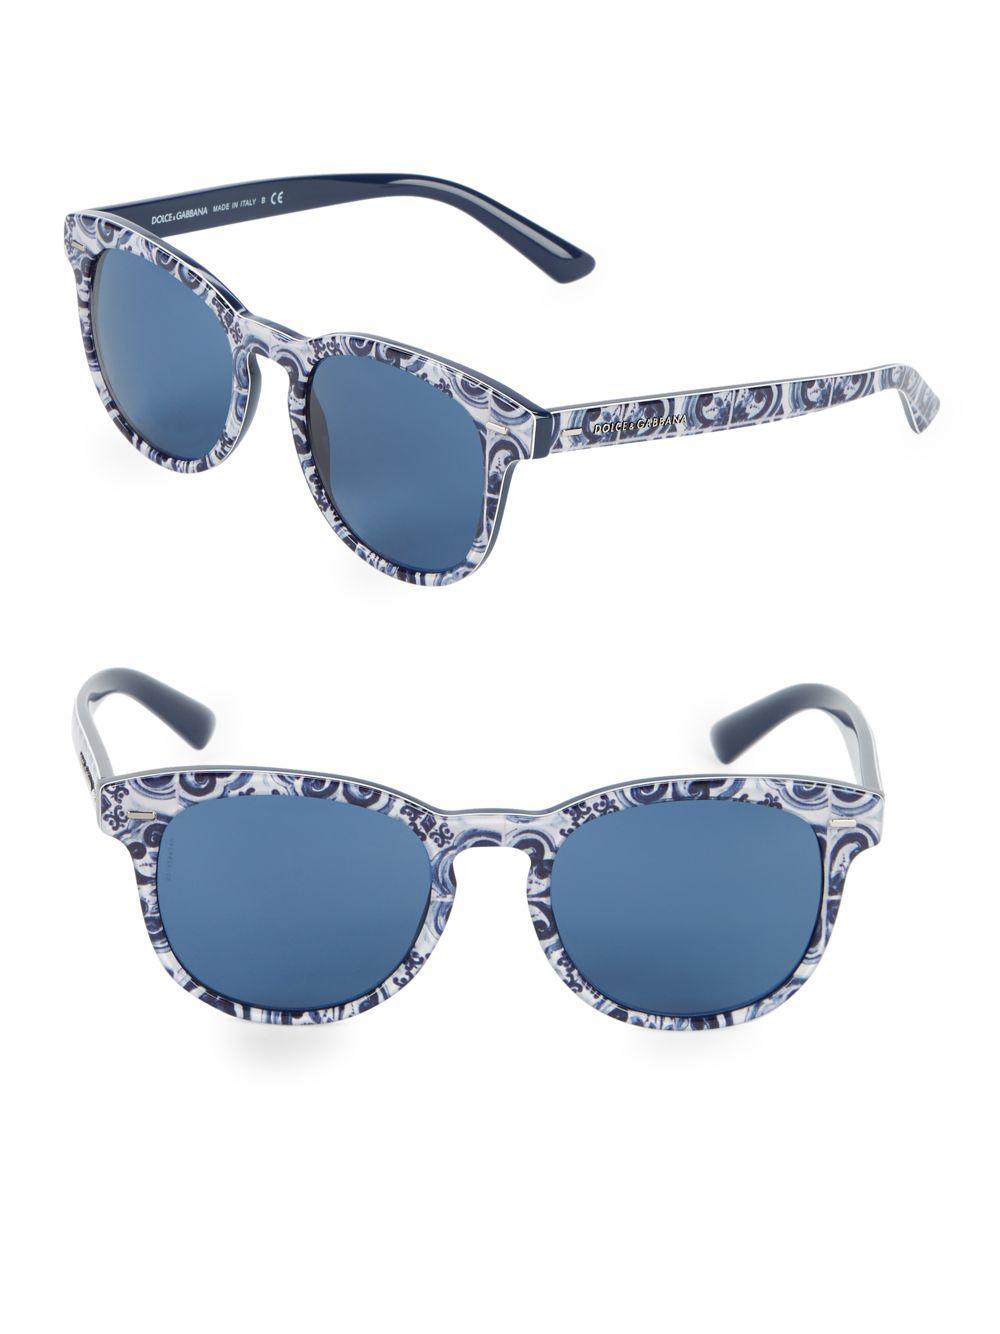 5b0a1f3d29b1 Dolce   Gabbana 51mm Scroll Tile Print Round Sunglasses in Blue - Lyst